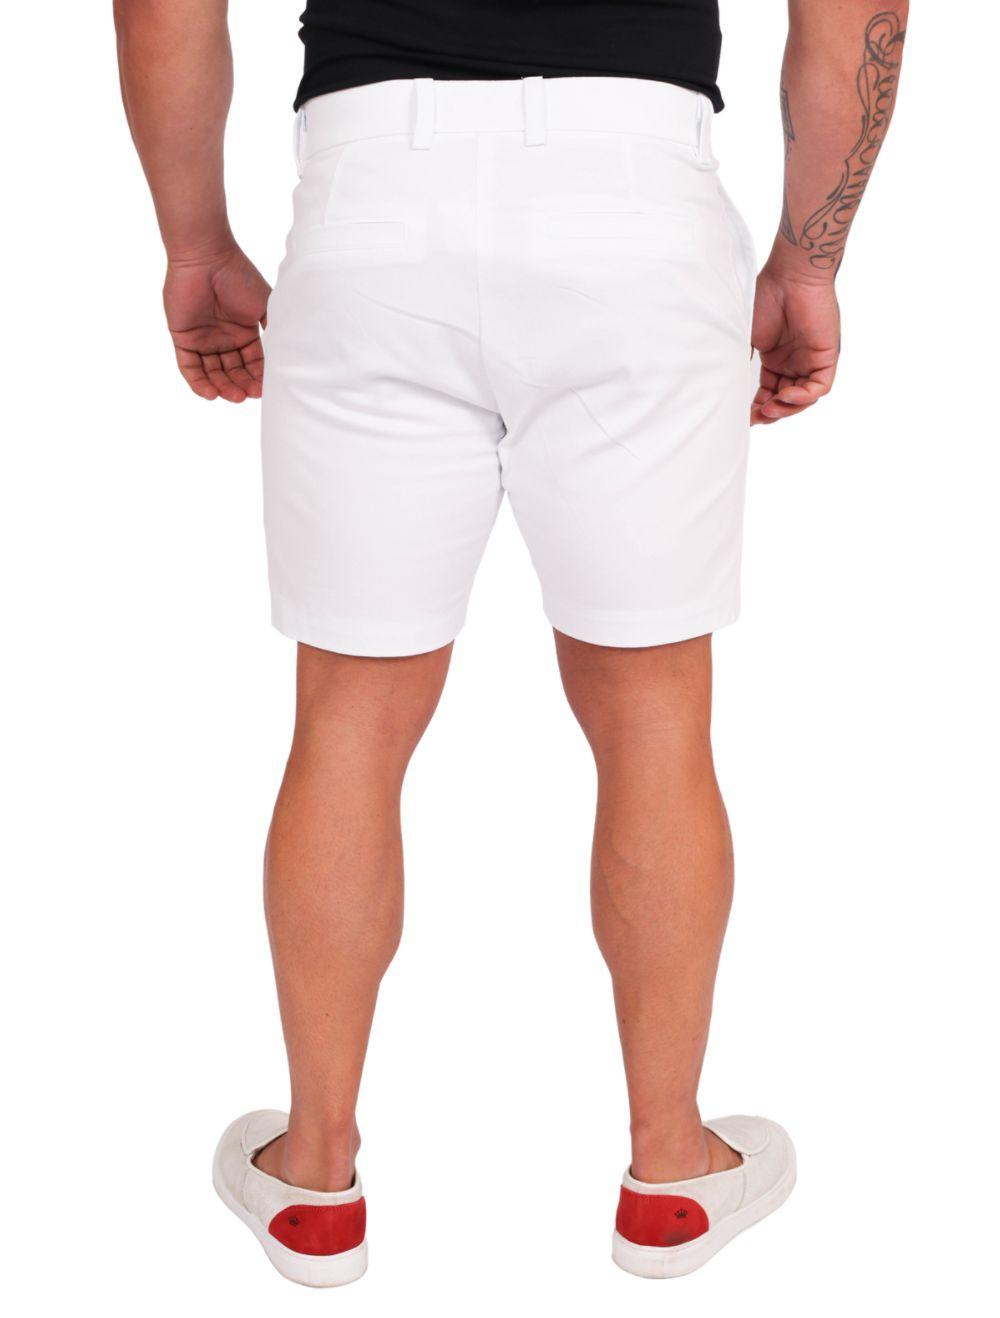 Bermuda Masculina em Sarja com Elastano Branco